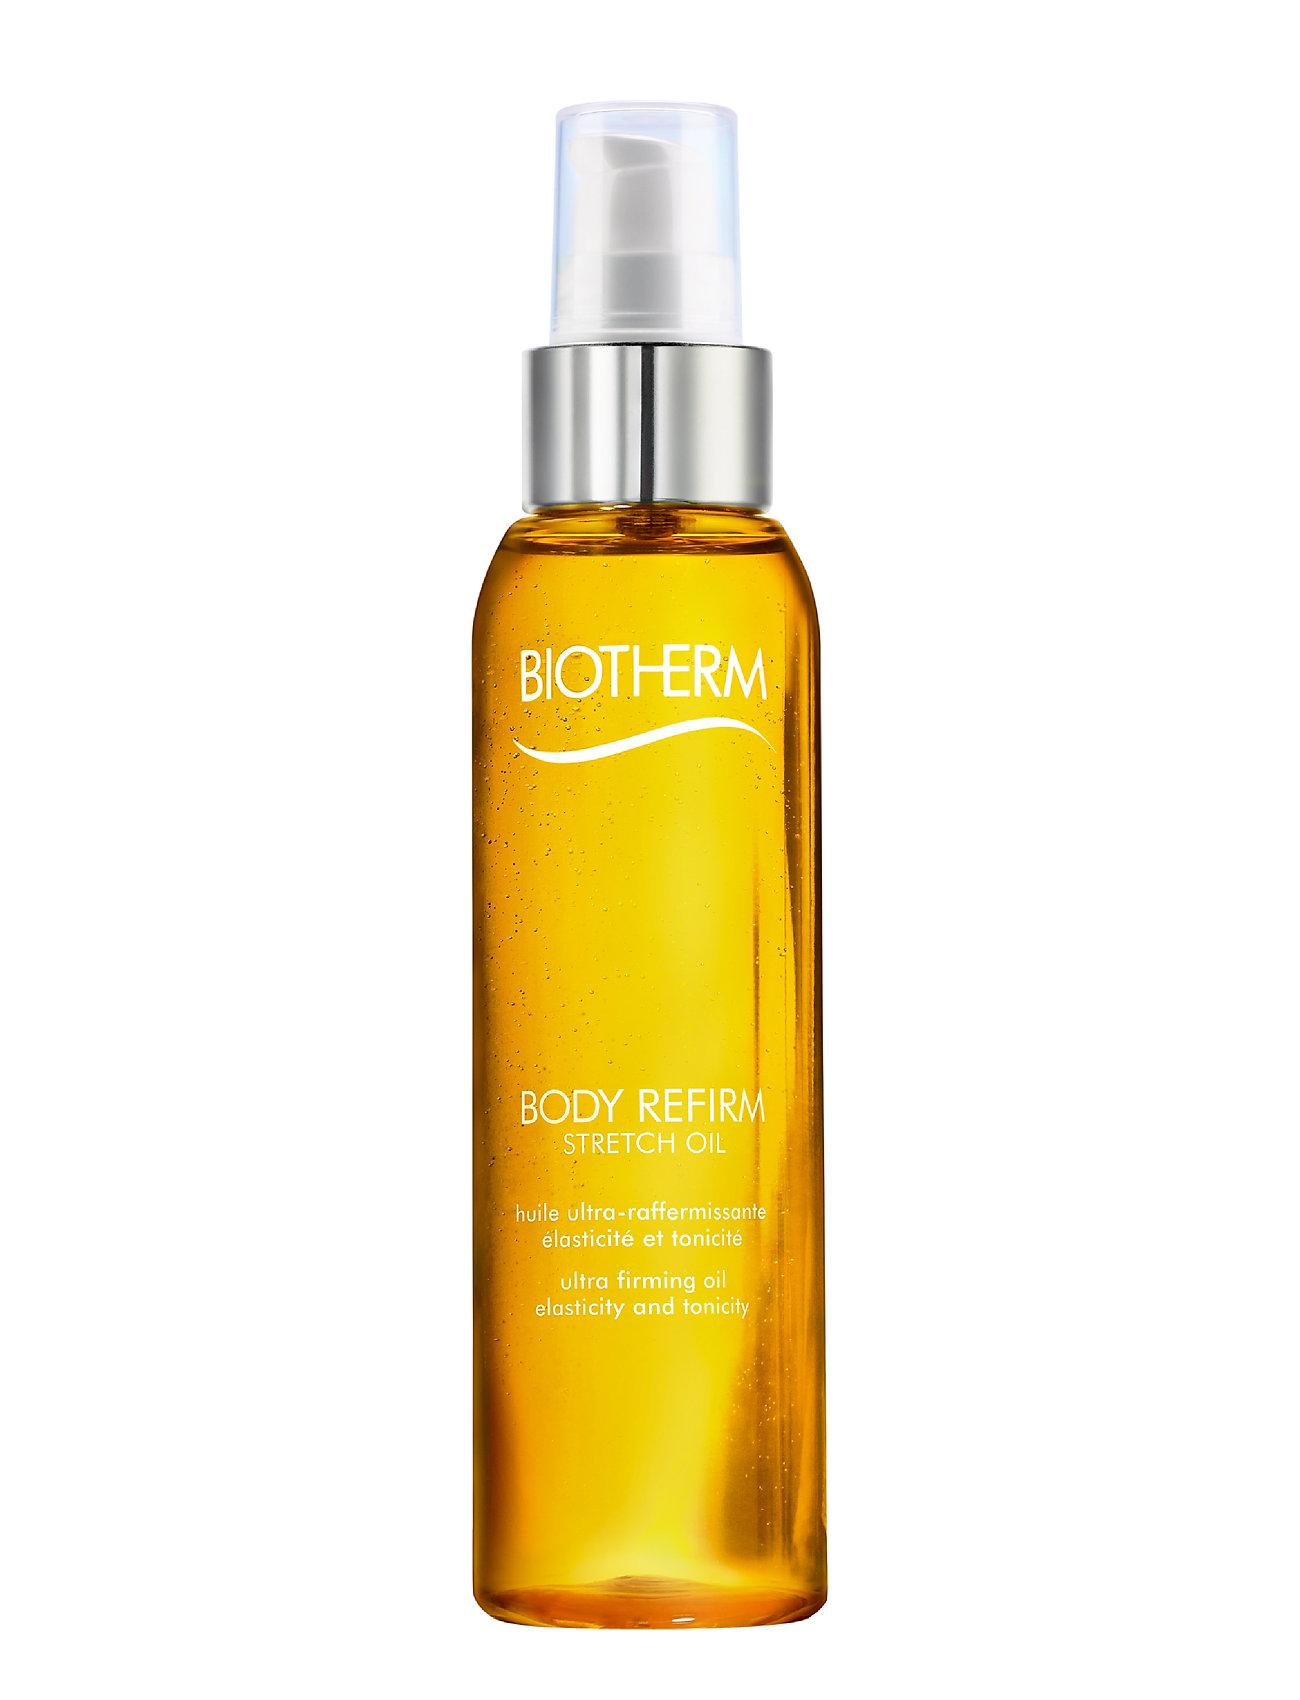 biotherm – Body resculpt stretch oil 125 ml på boozt.com dk